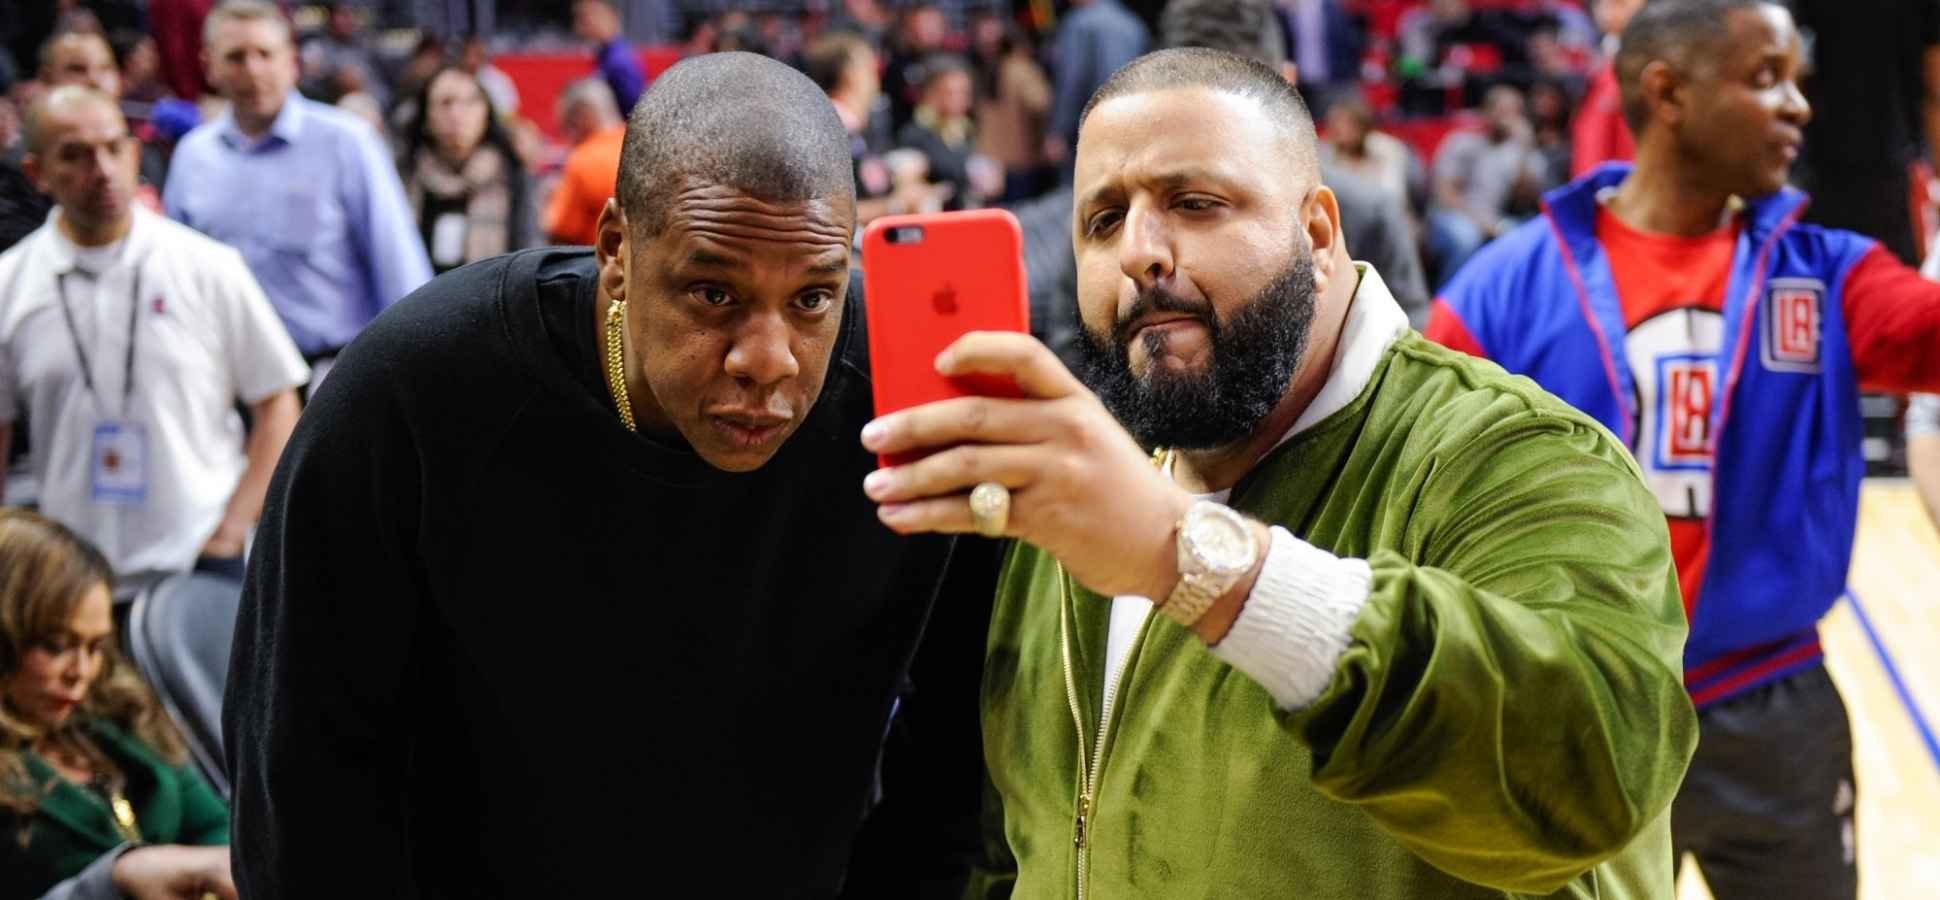 4 Marketing Lessons From Snapchat Genius DJ Khaled